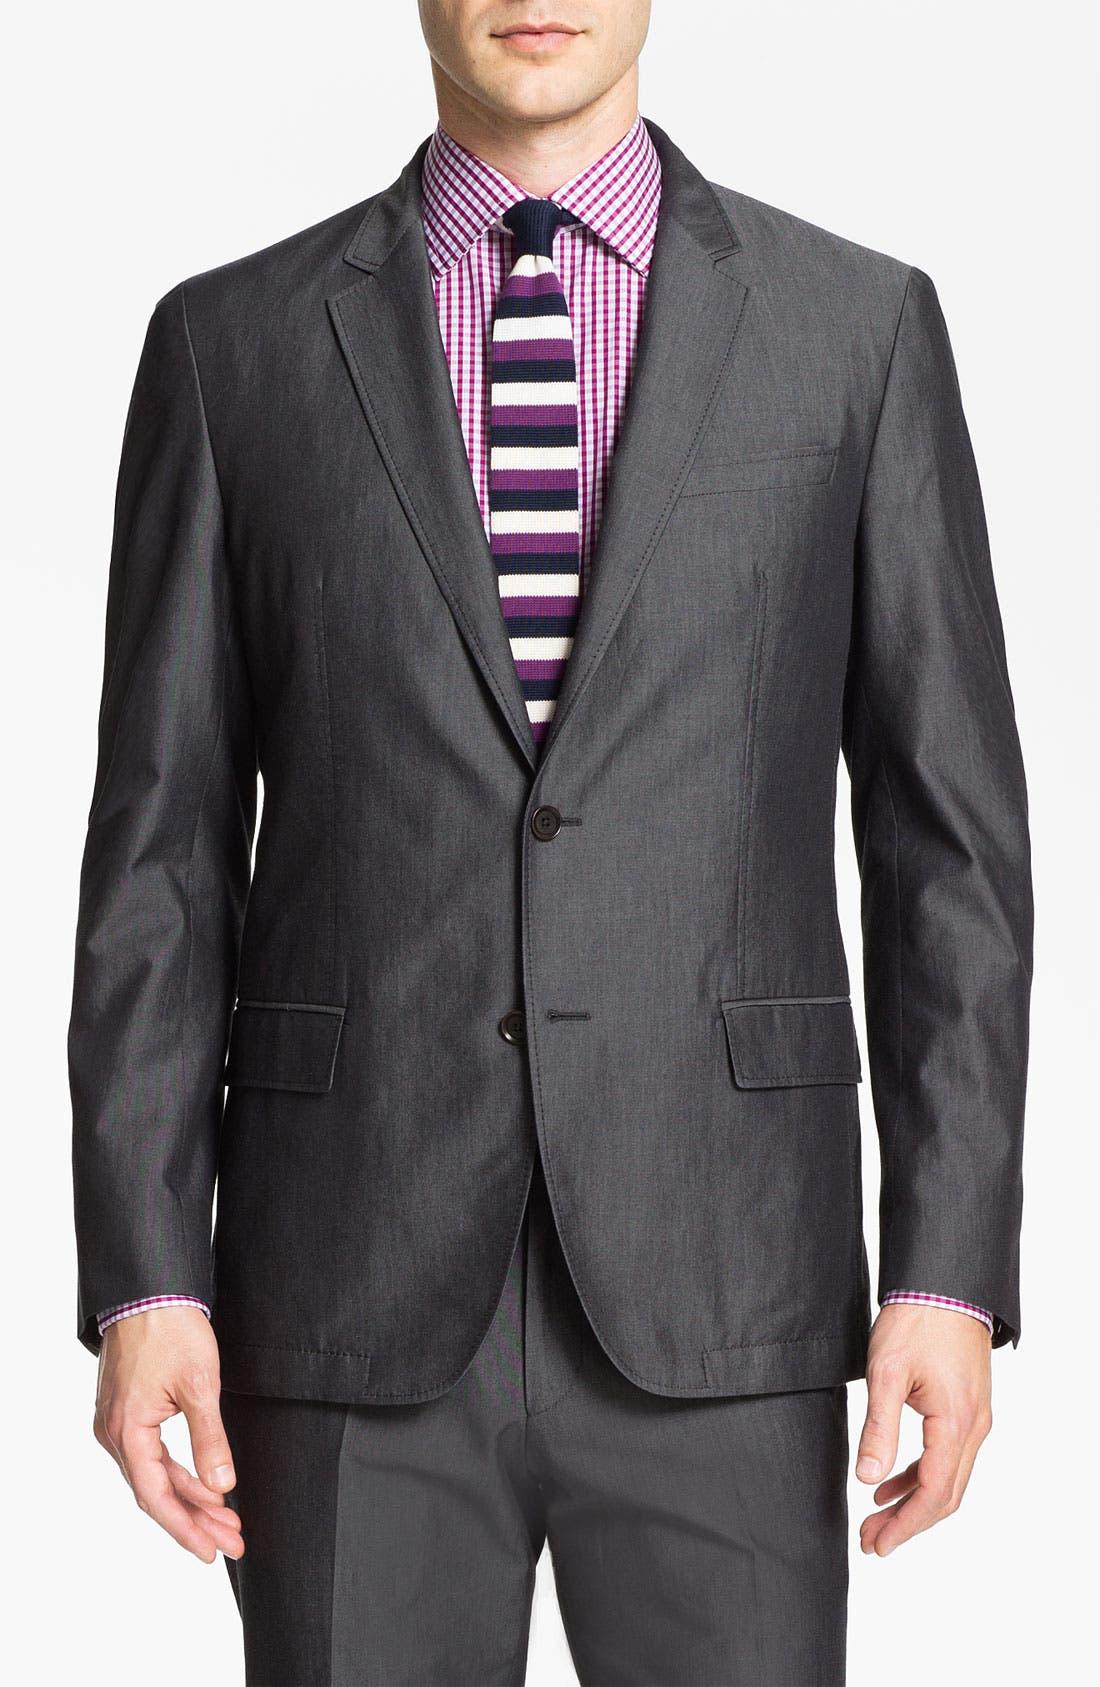 Main Image - BOSS HUGO BOSS 'Heaven/Fly' Trim Fit Cotton Blend Suit